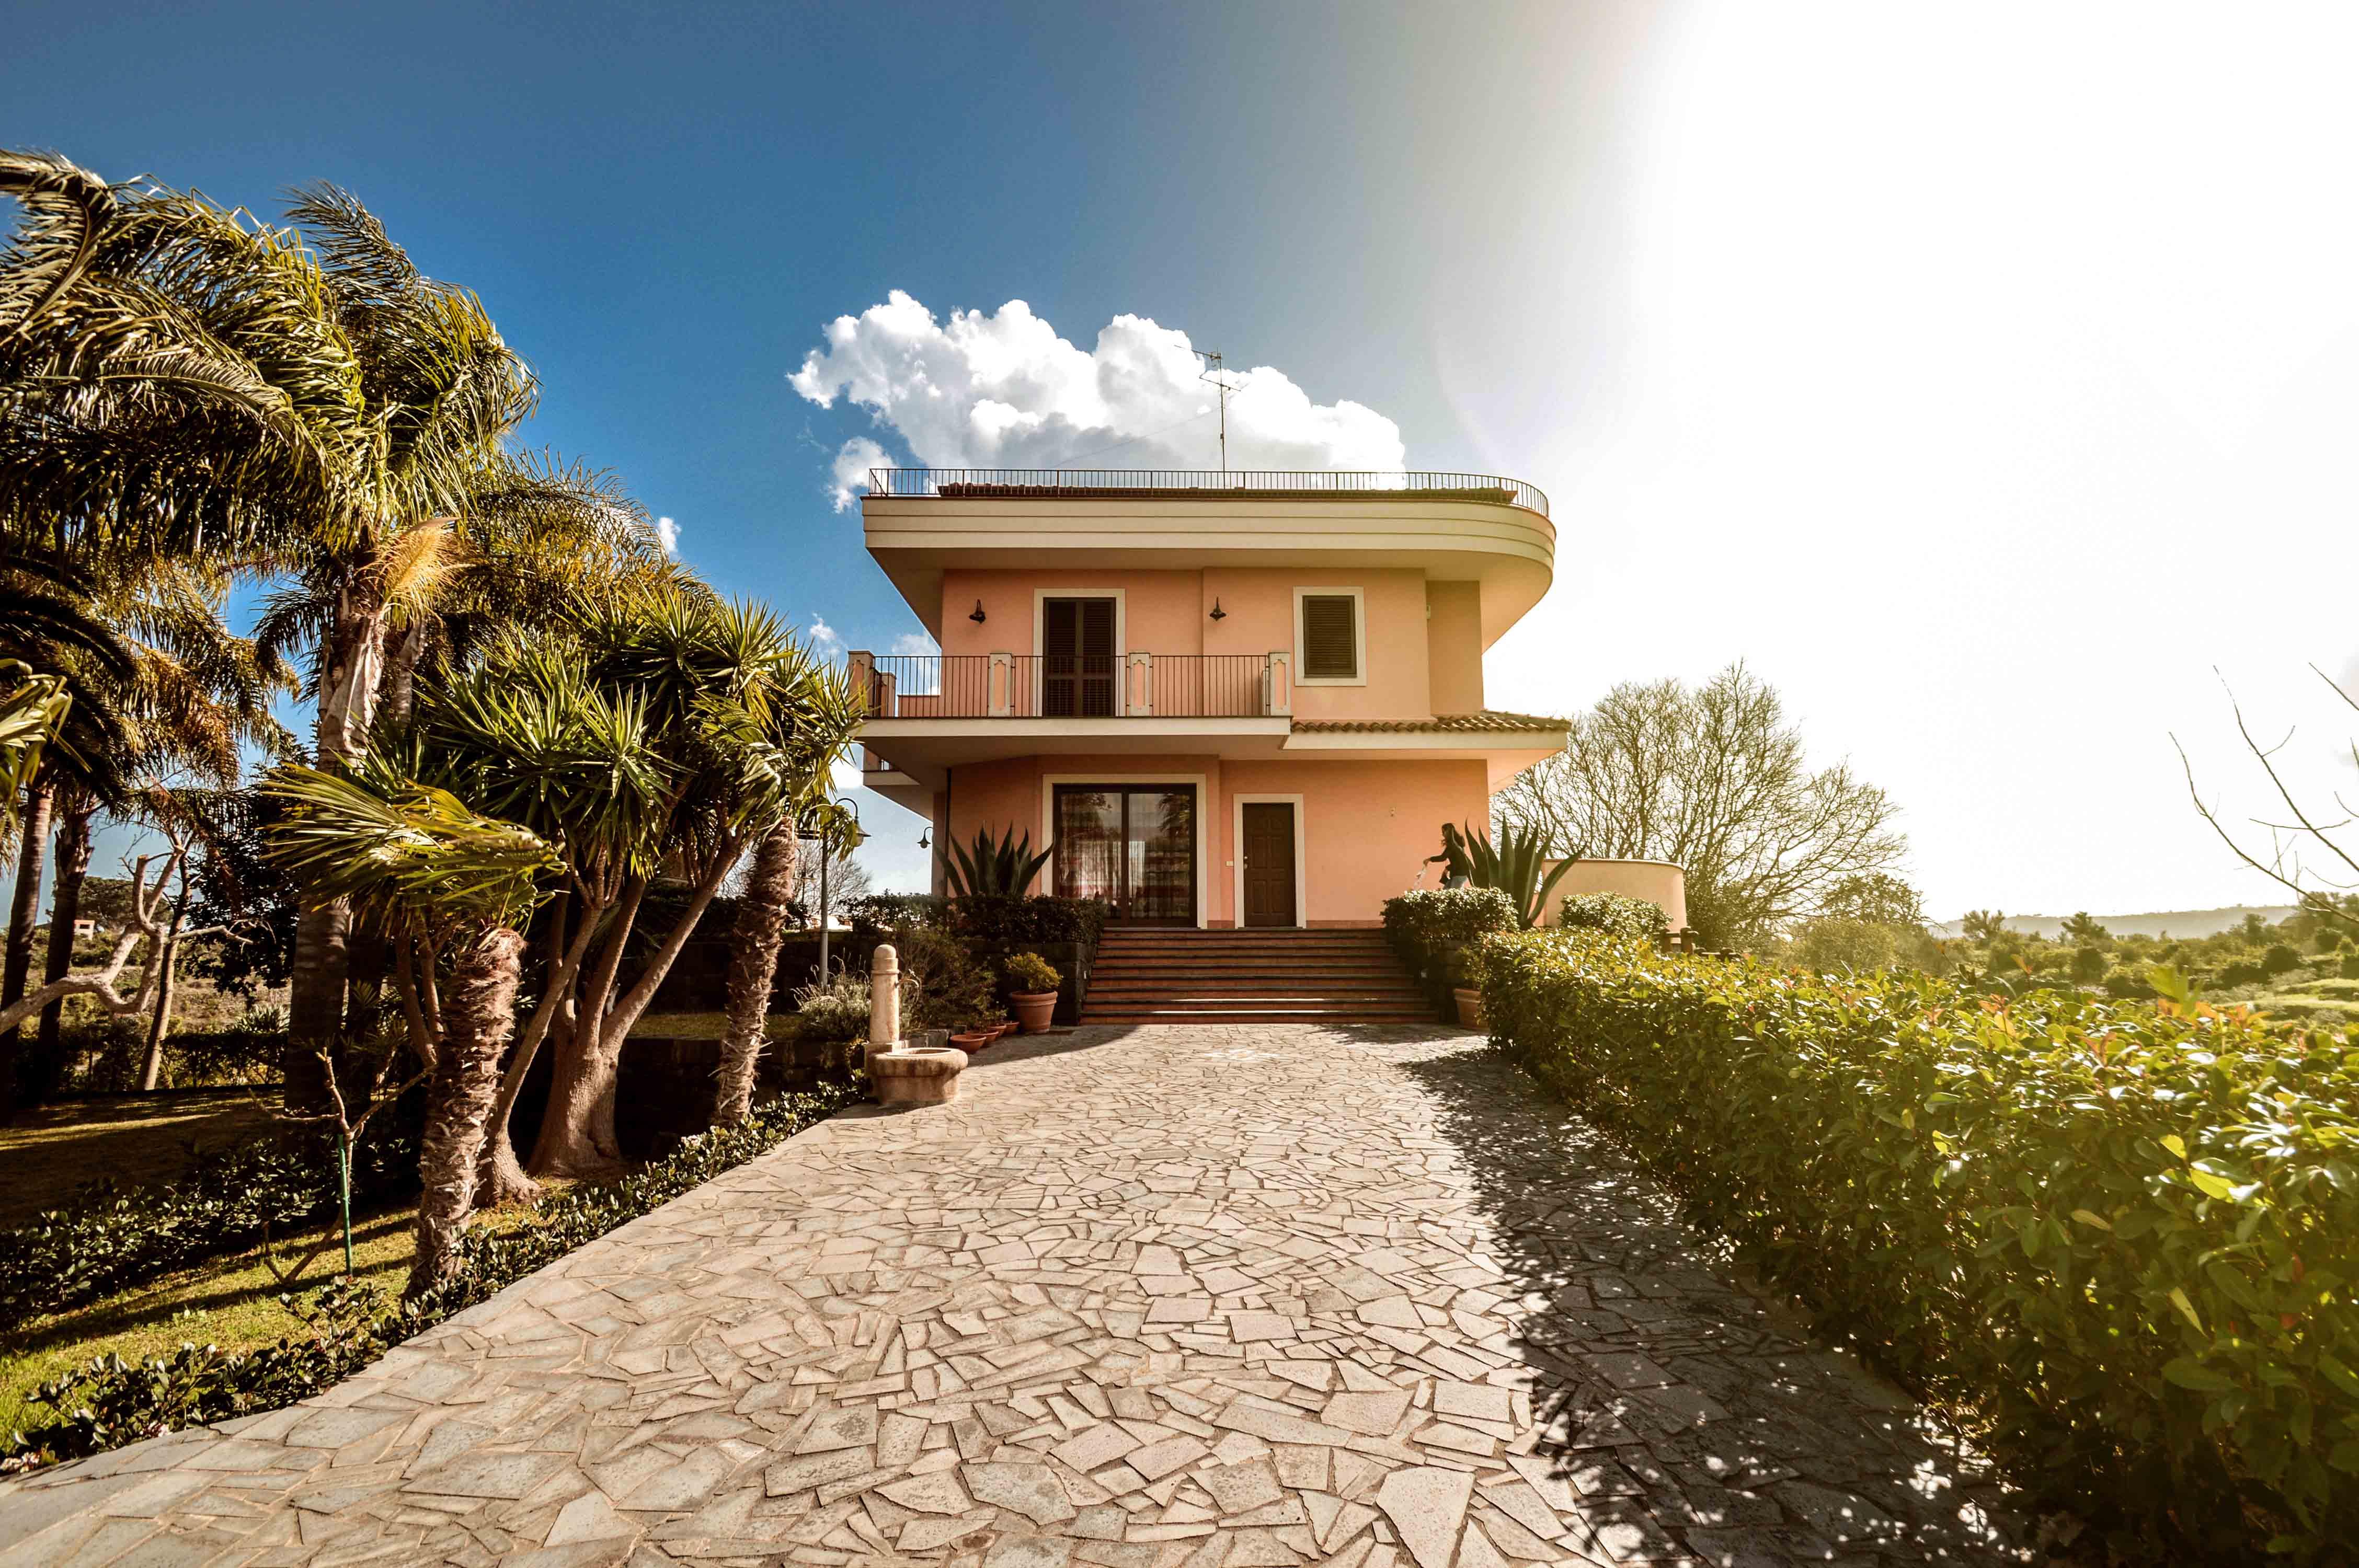 Ferienhaus Villa Giada- enjoys views of Mount Etna and the sea, a true paradise (2383441), Acireale, Catania, Sizilien, Italien, Bild 35